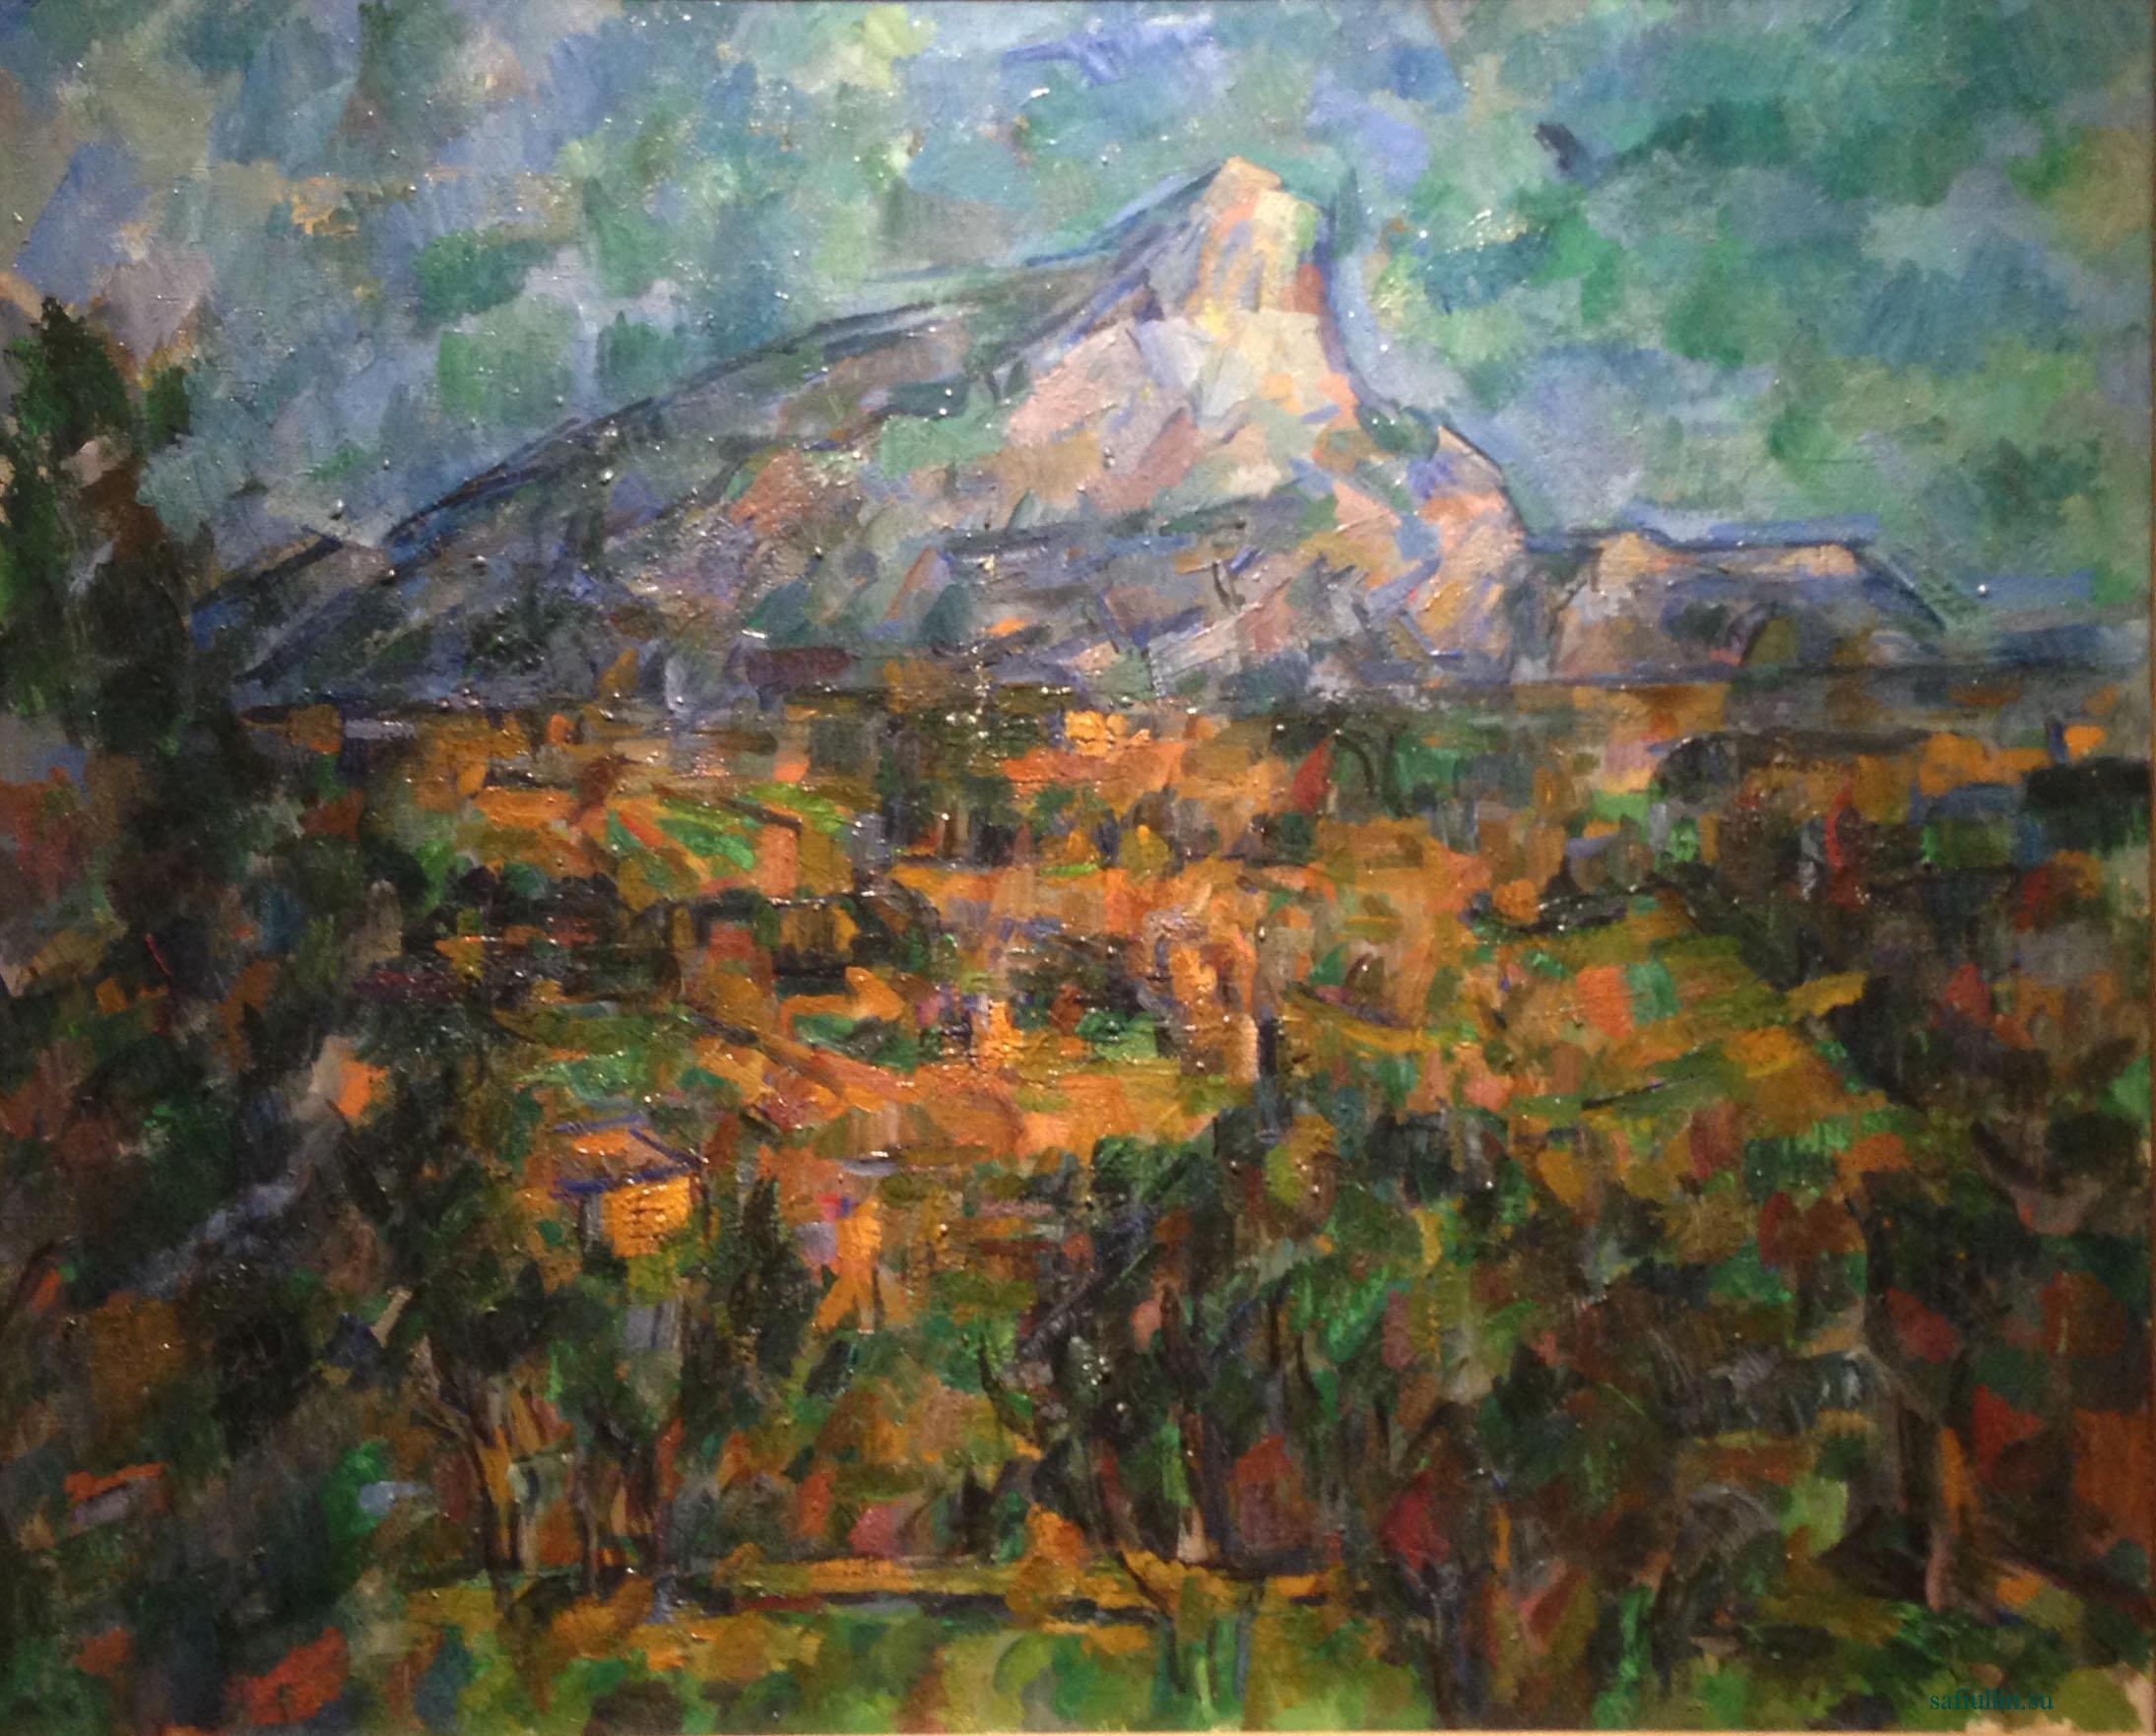 Сезанн картина Гора Св.Виктории музей Пушкина пейзаж Сафиуллин